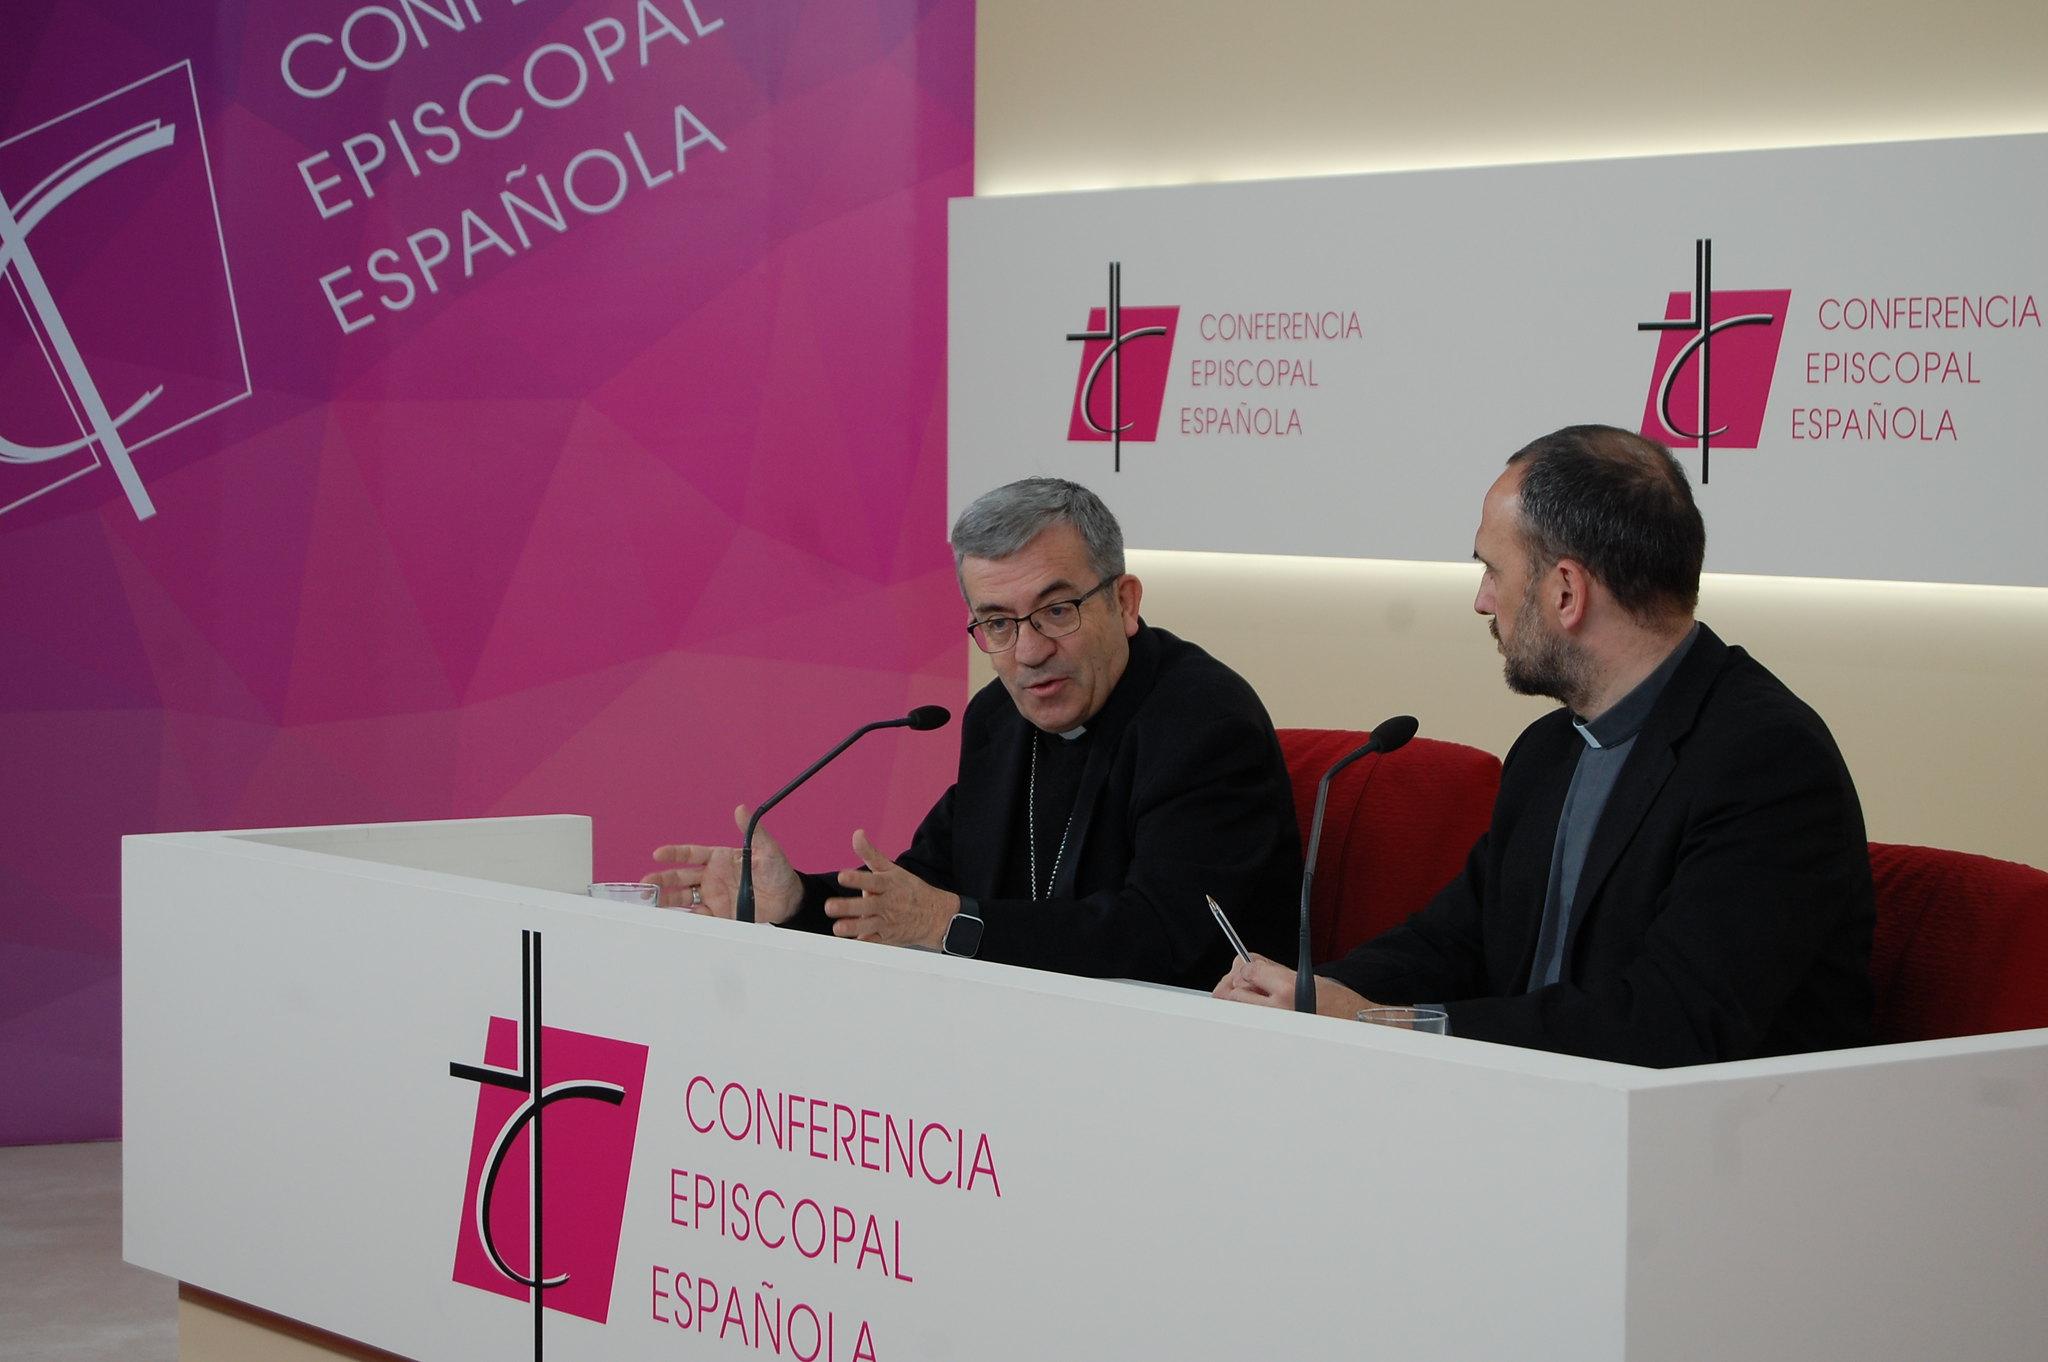 Mons. Luis Argüello en rueda de prensa © Conferencia Episcopal Española